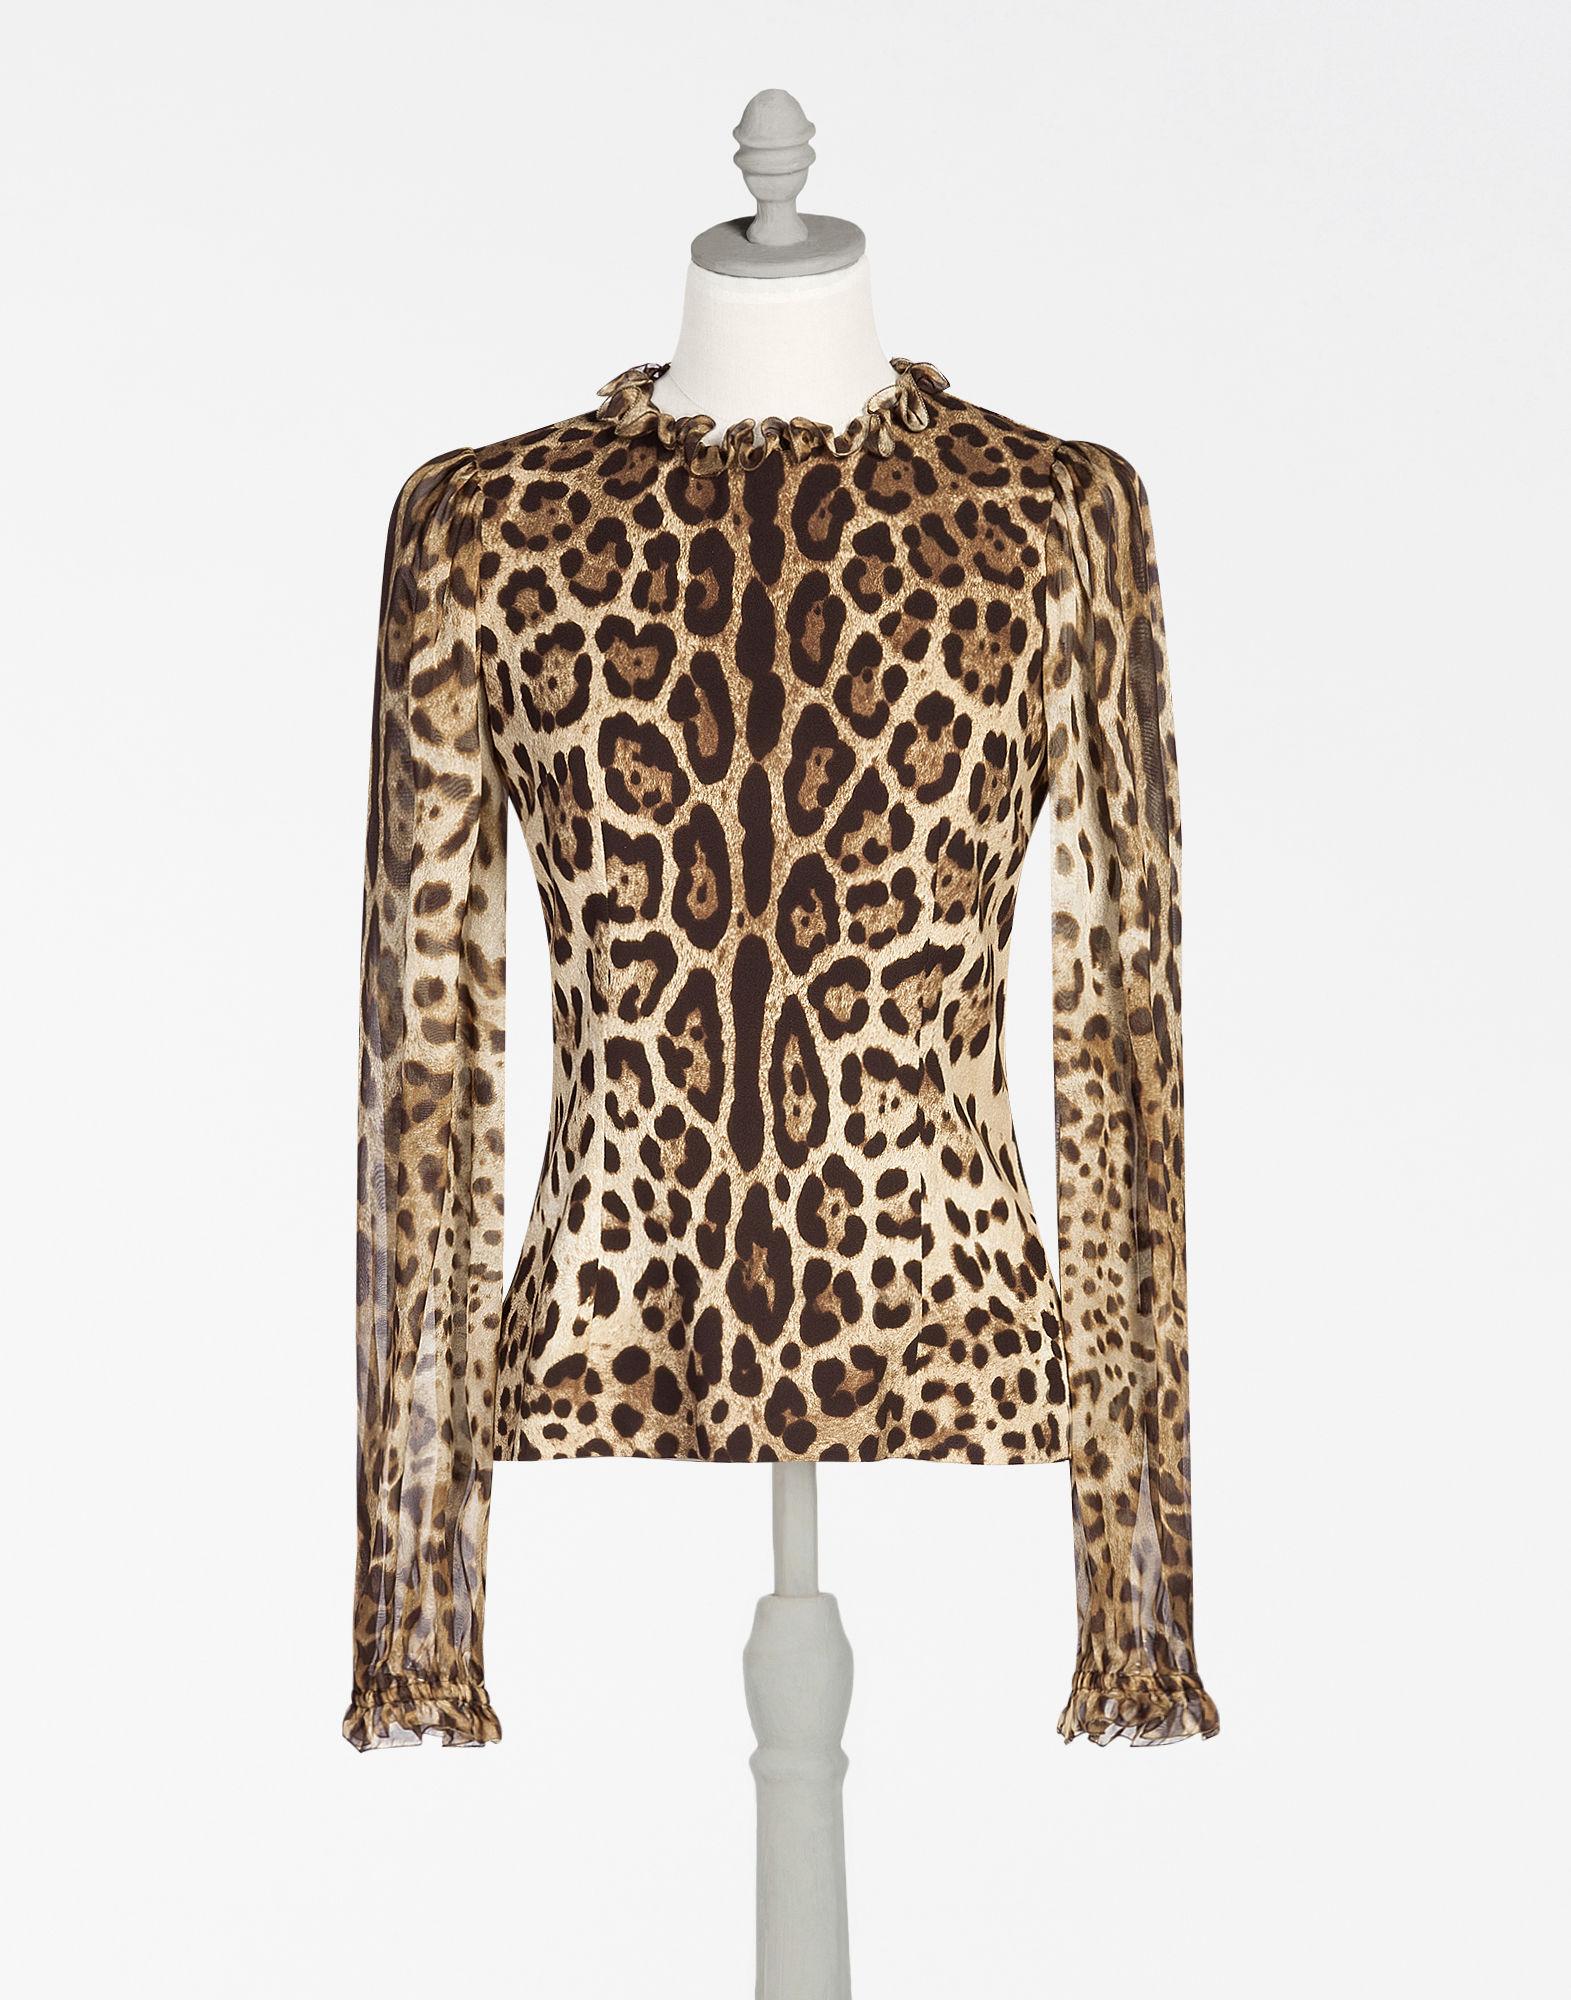 Dolce & Gabbana Silks PRINTED CADY BLOUSE